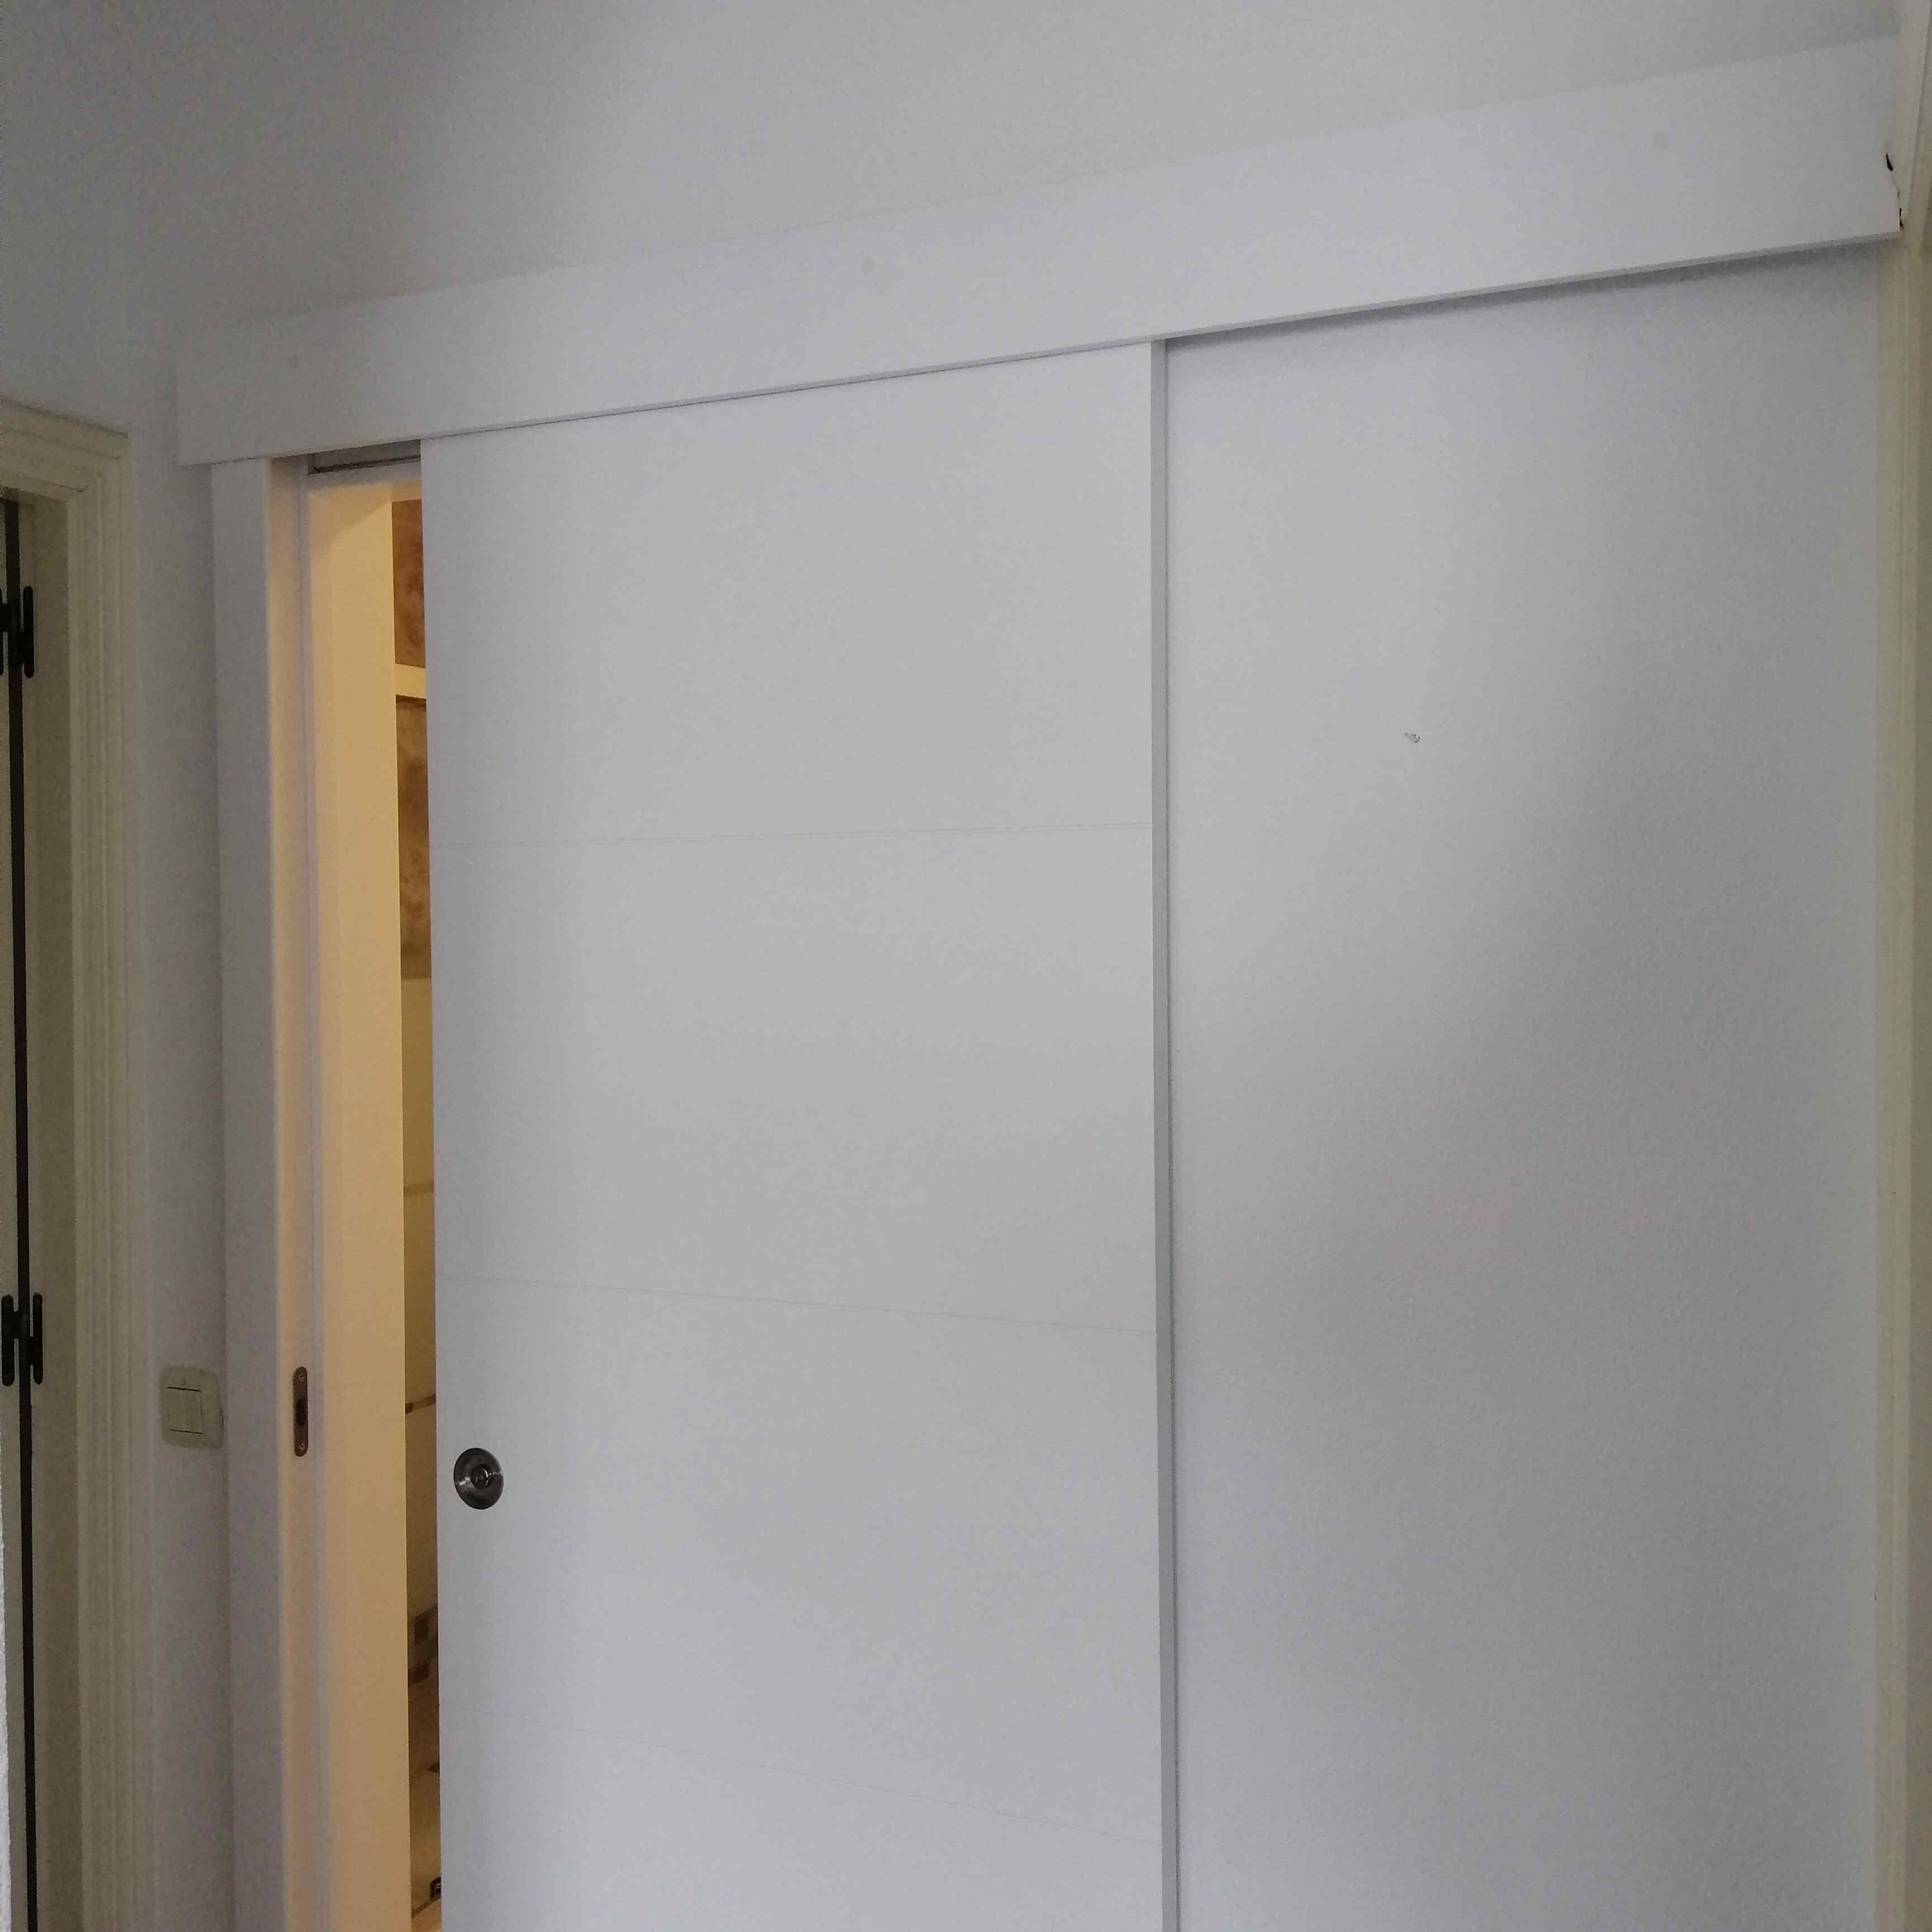 carpinteria-de-madera-puerta-corredera-vista-pilar-de-la-horadada-torrevieja